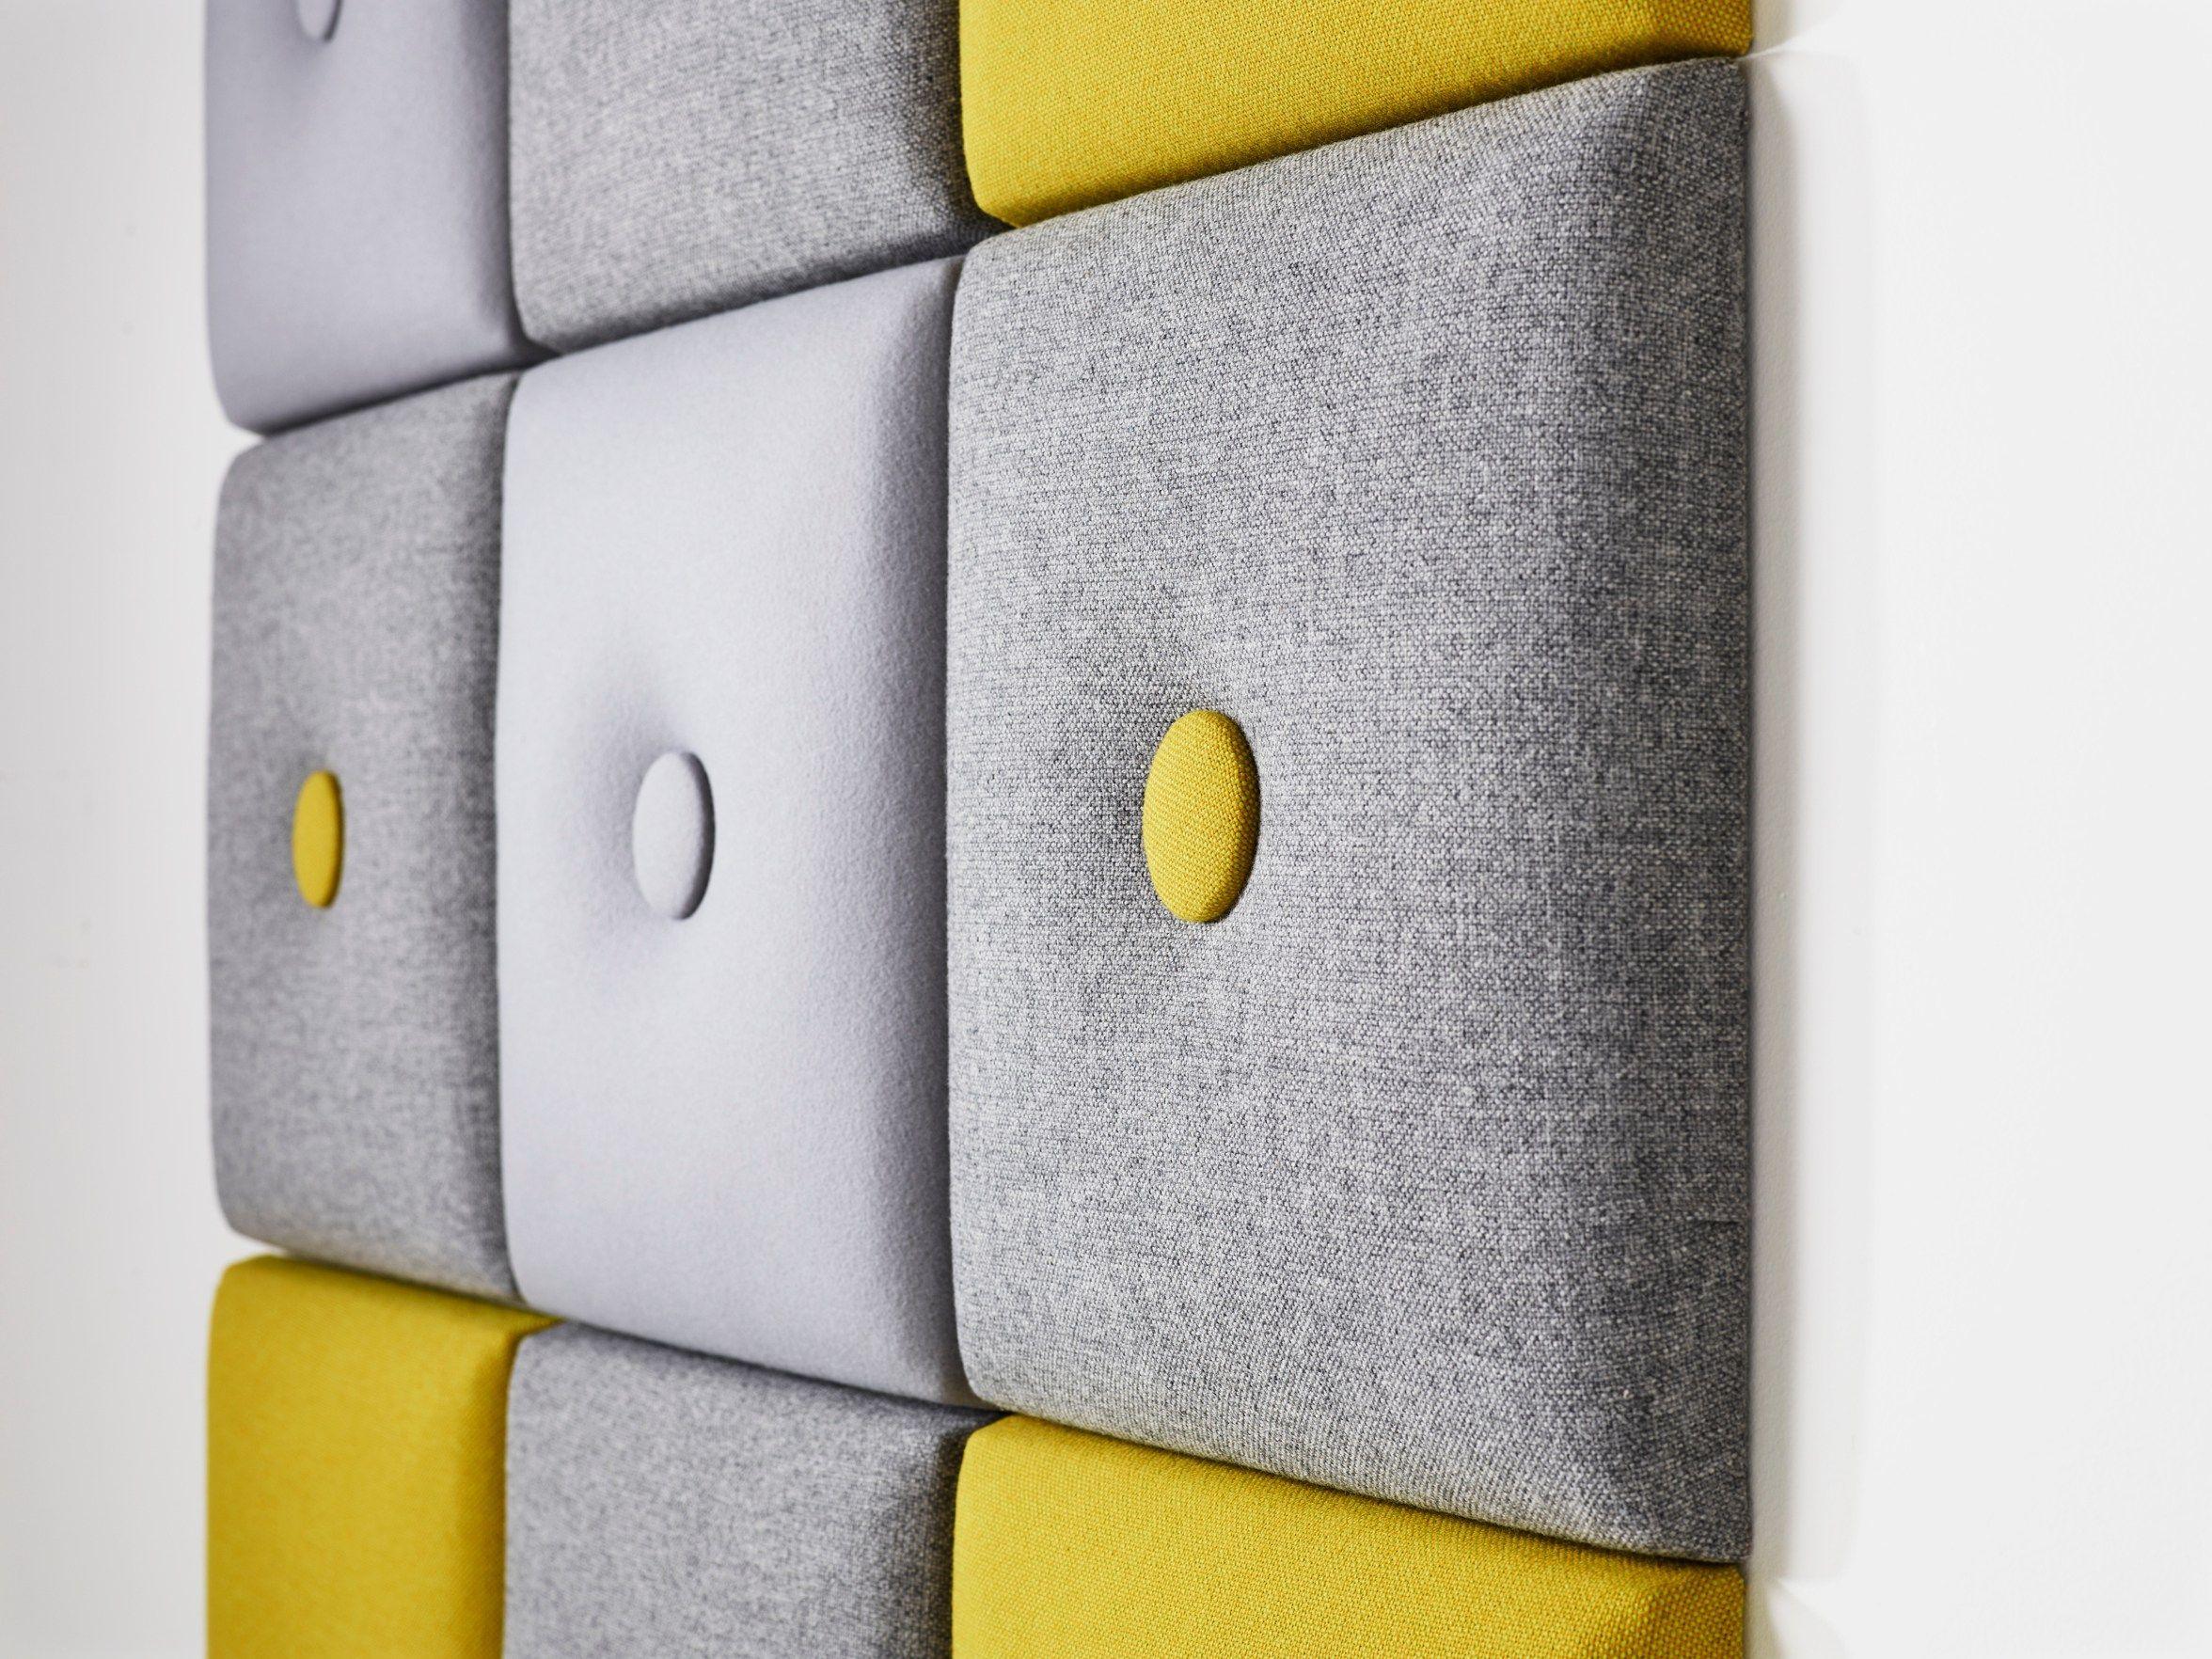 Recycled Material Decorative Acoustical Panels Pillow By Karl Andersson Soner Design Joel Karlsson Schallabsorber Akustik Akustik Panel